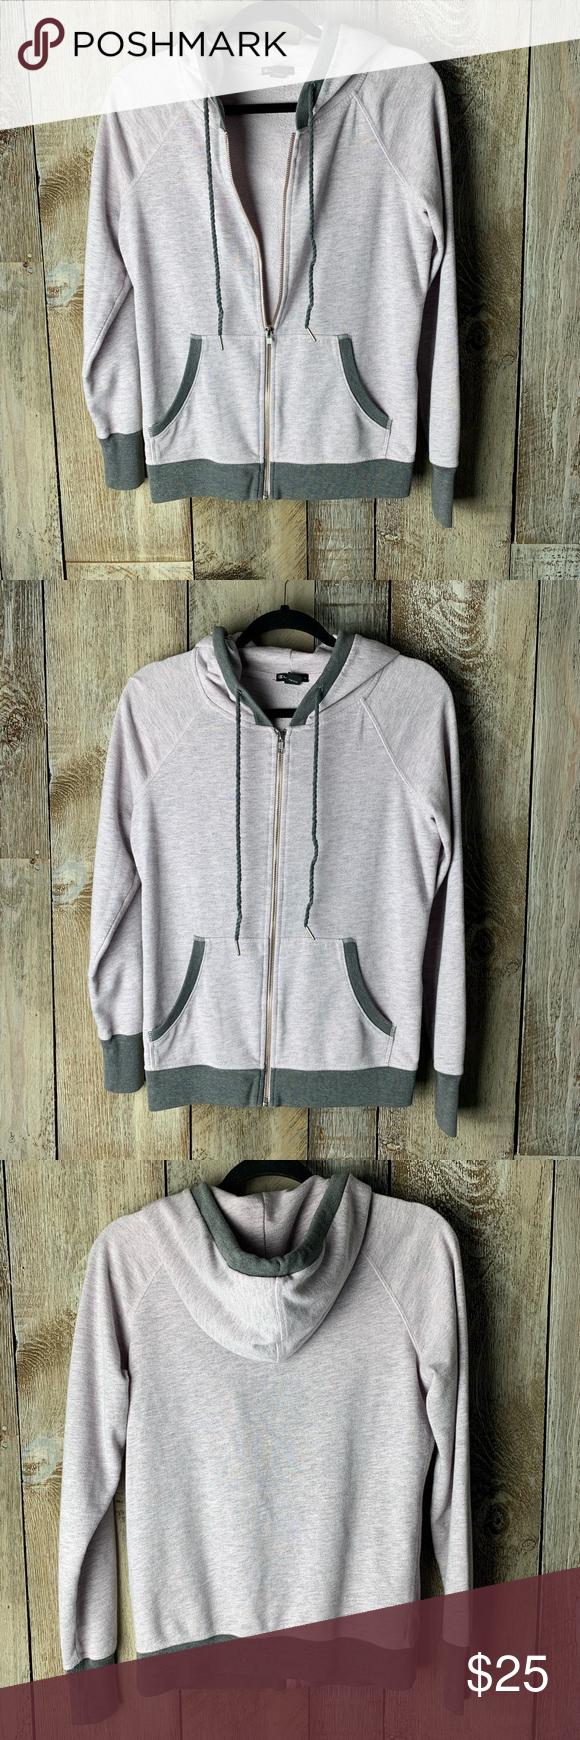 Champion Elite Hoodie Sz M Grey With Hints Of Pink Sweatshirt Tops Champion Tops Clothes Design [ 1740 x 580 Pixel ]